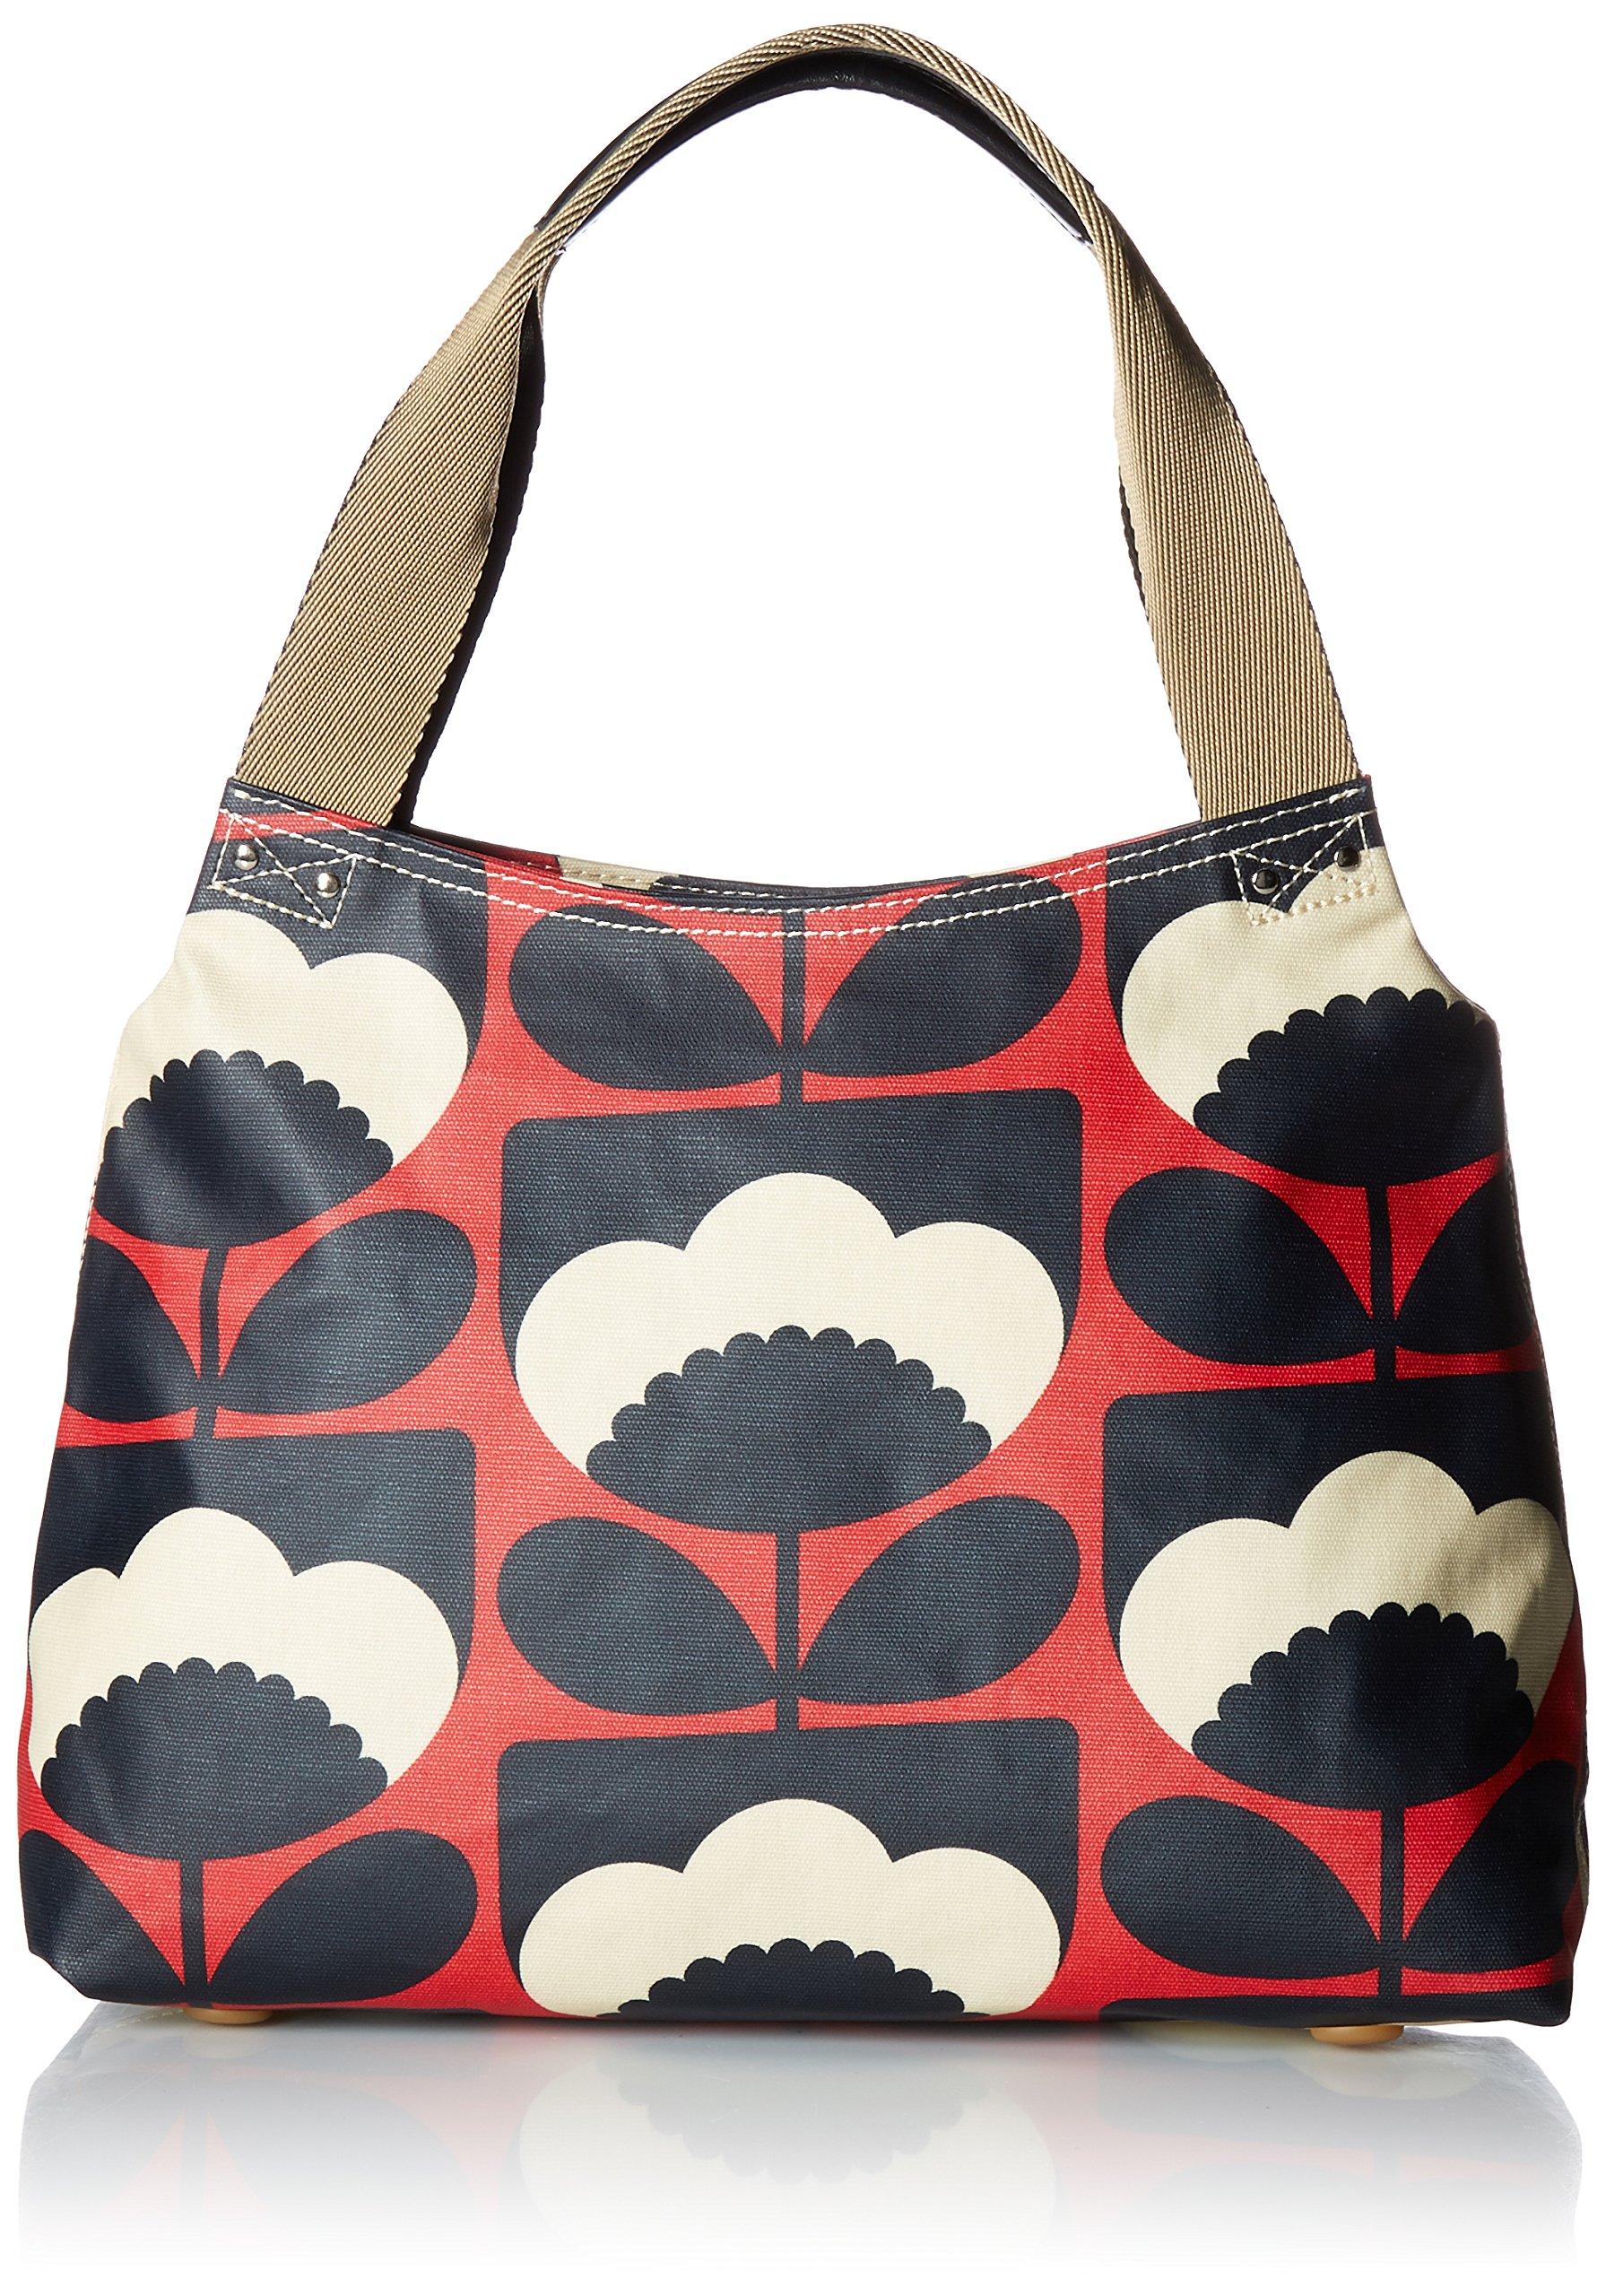 Orla Shoulder Femme Kiely BagSac Classic Zip 9IDH2WE